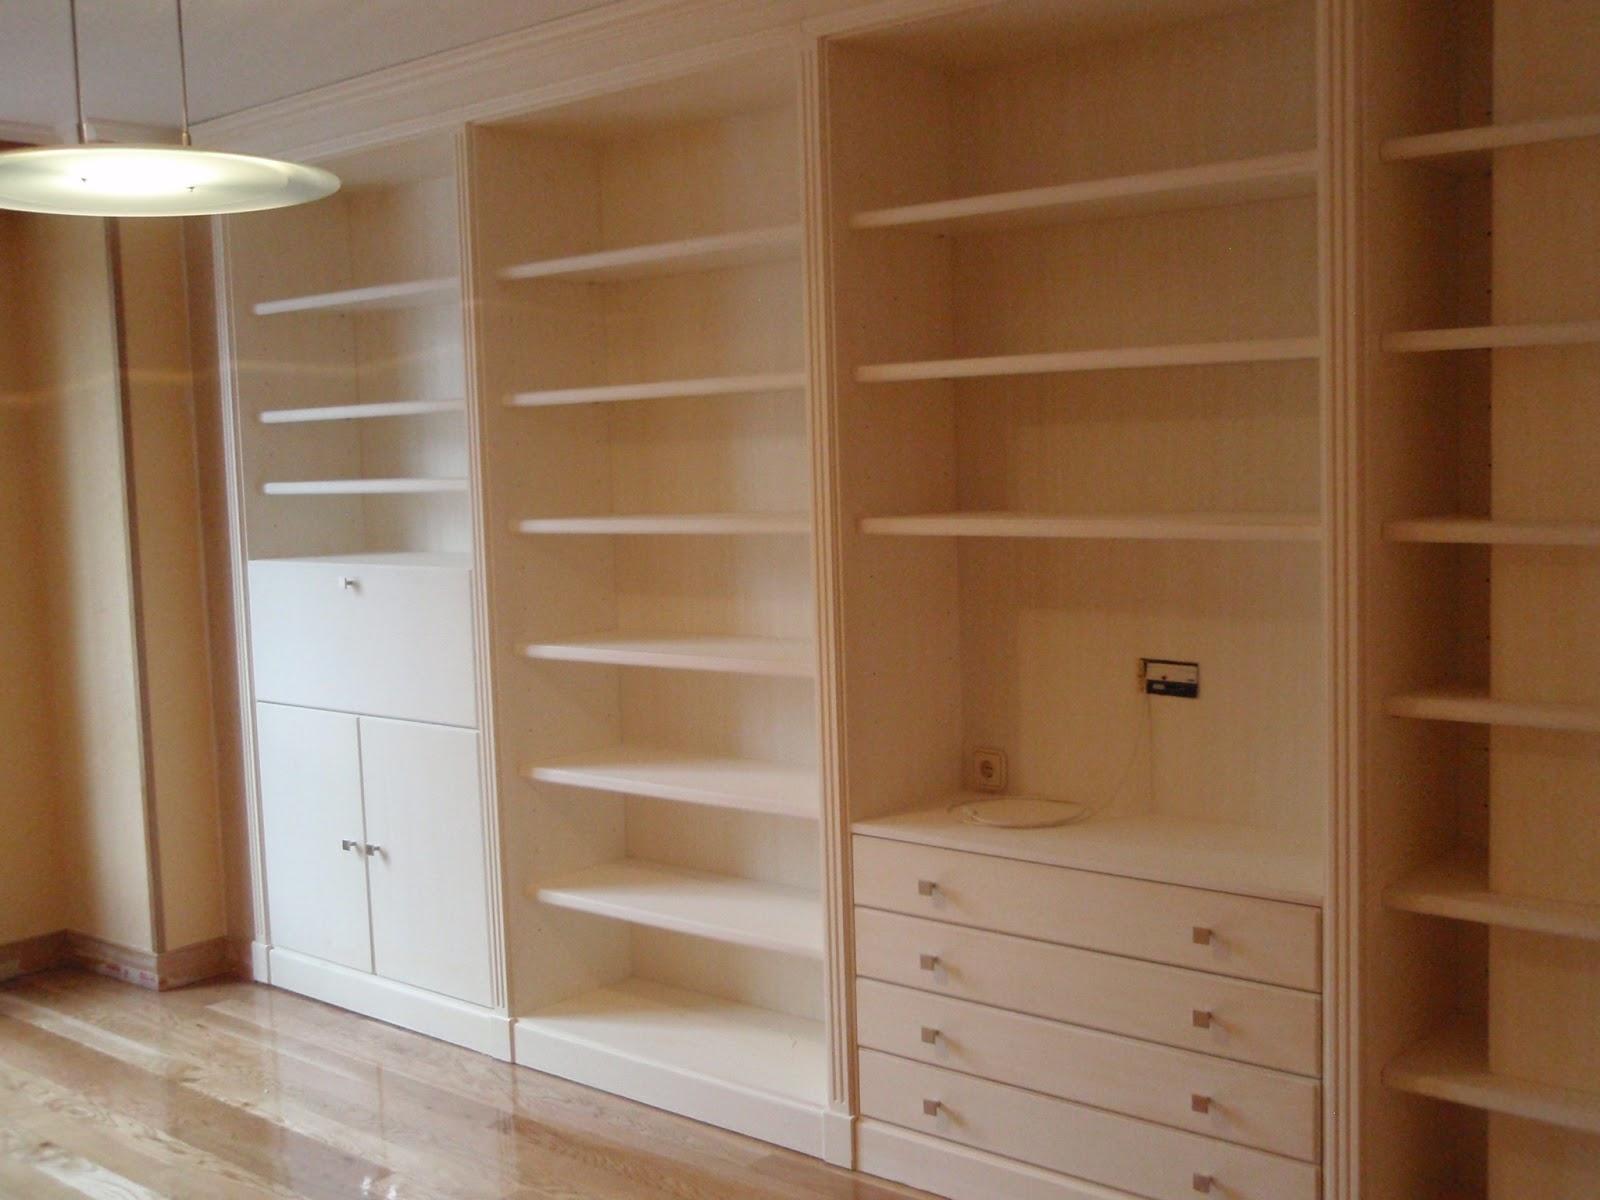 Mueble de pared completa a medida en madera lacada carpinter a y restauraci n de muebles a - Madera a medida ...